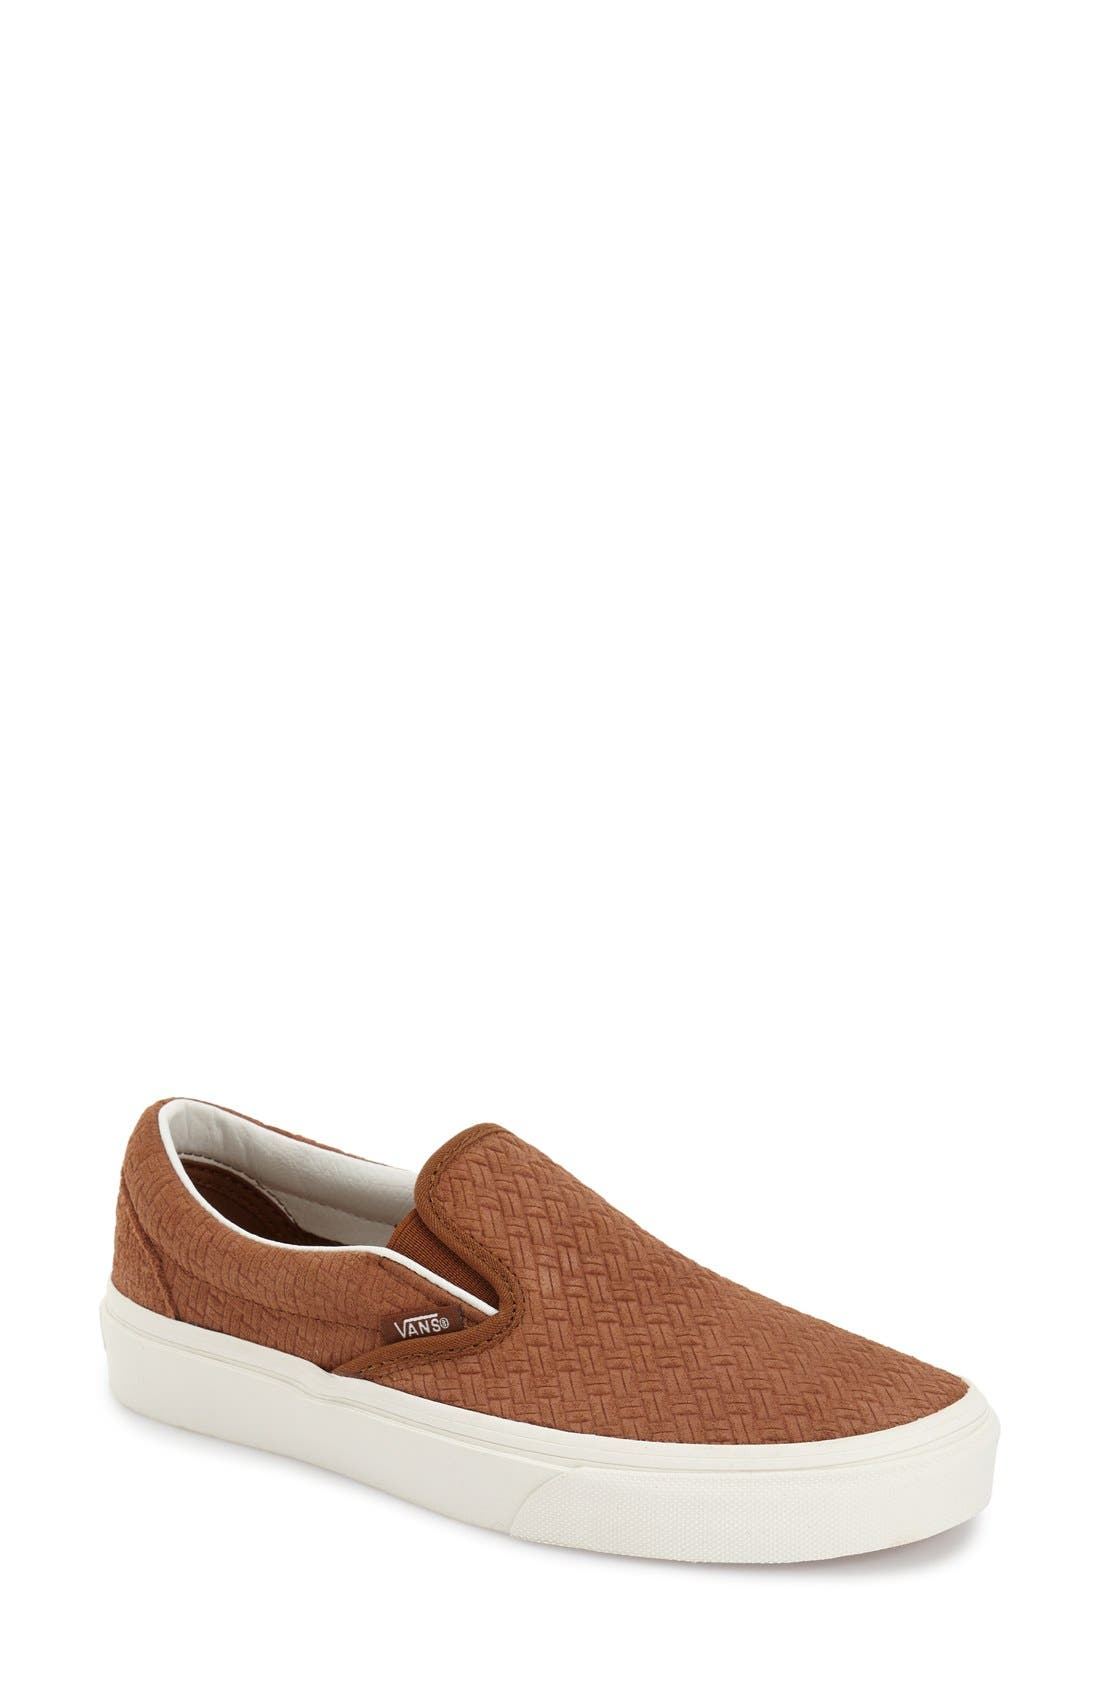 ,                             Classic Slip-On Sneaker,                             Main thumbnail 310, color,                             205